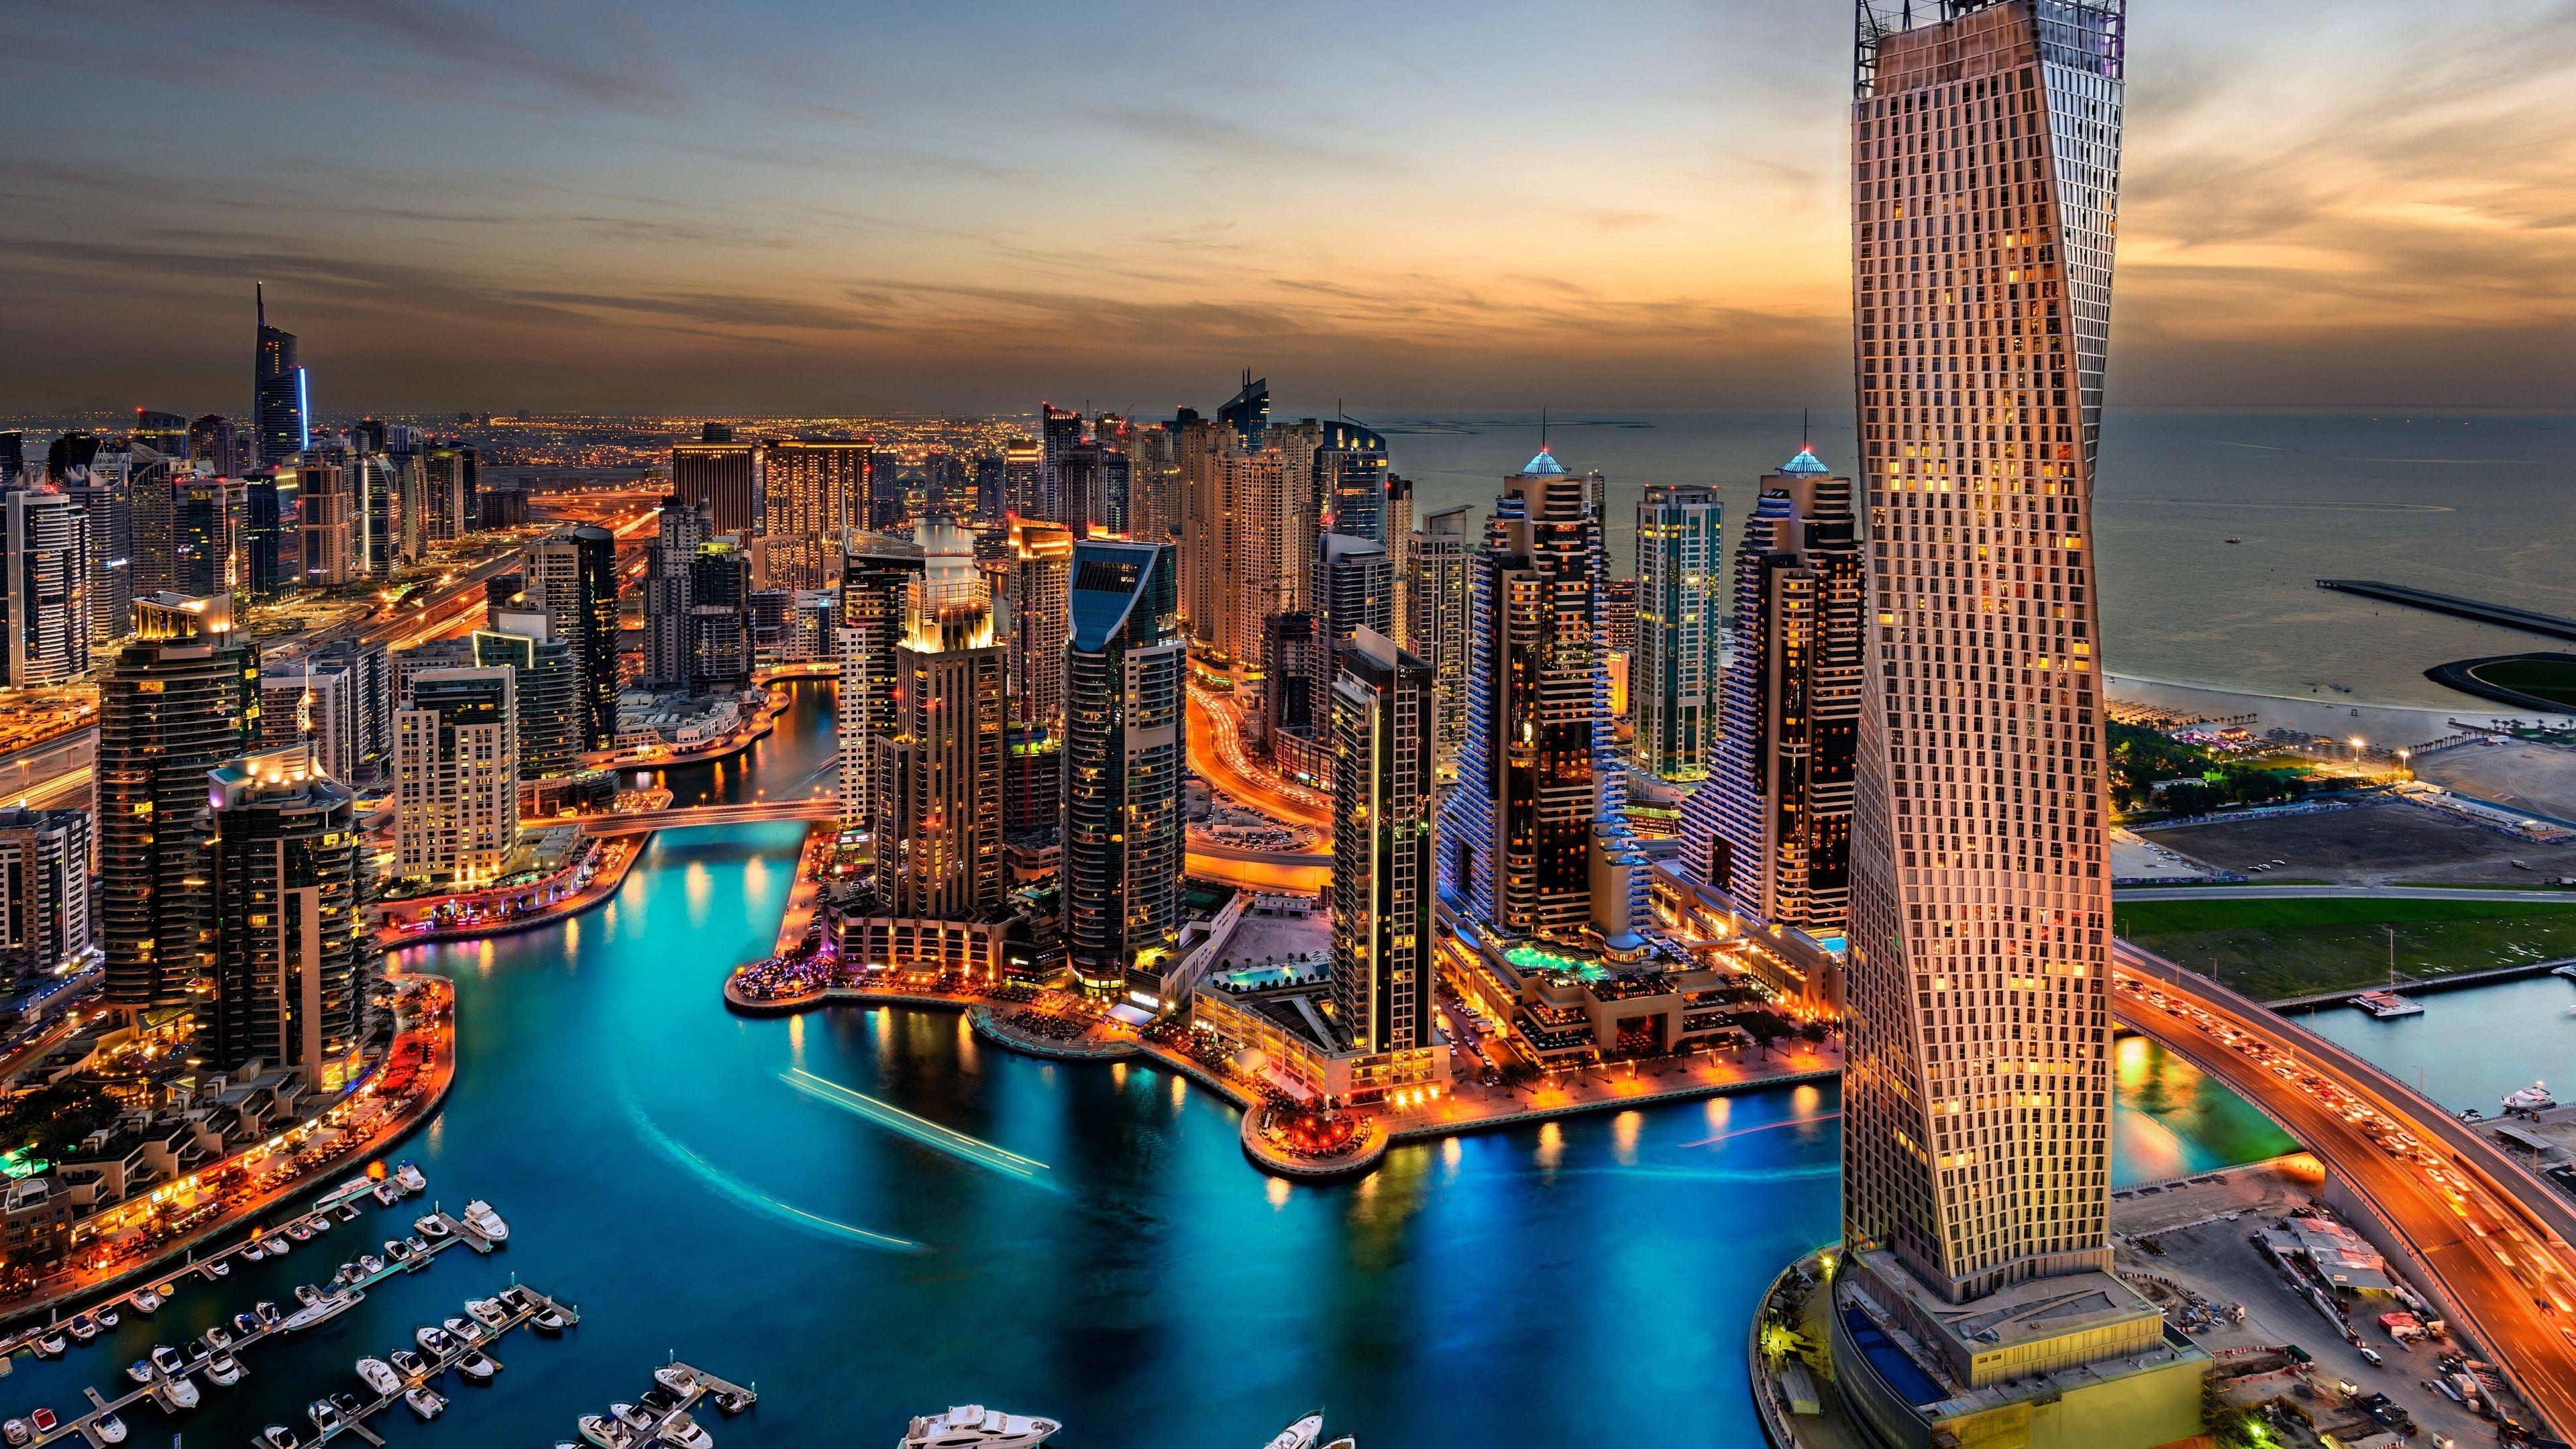 Fantastic Ultra Hd Wallpaper 46966 Dubai Hotel Burj Khalifa